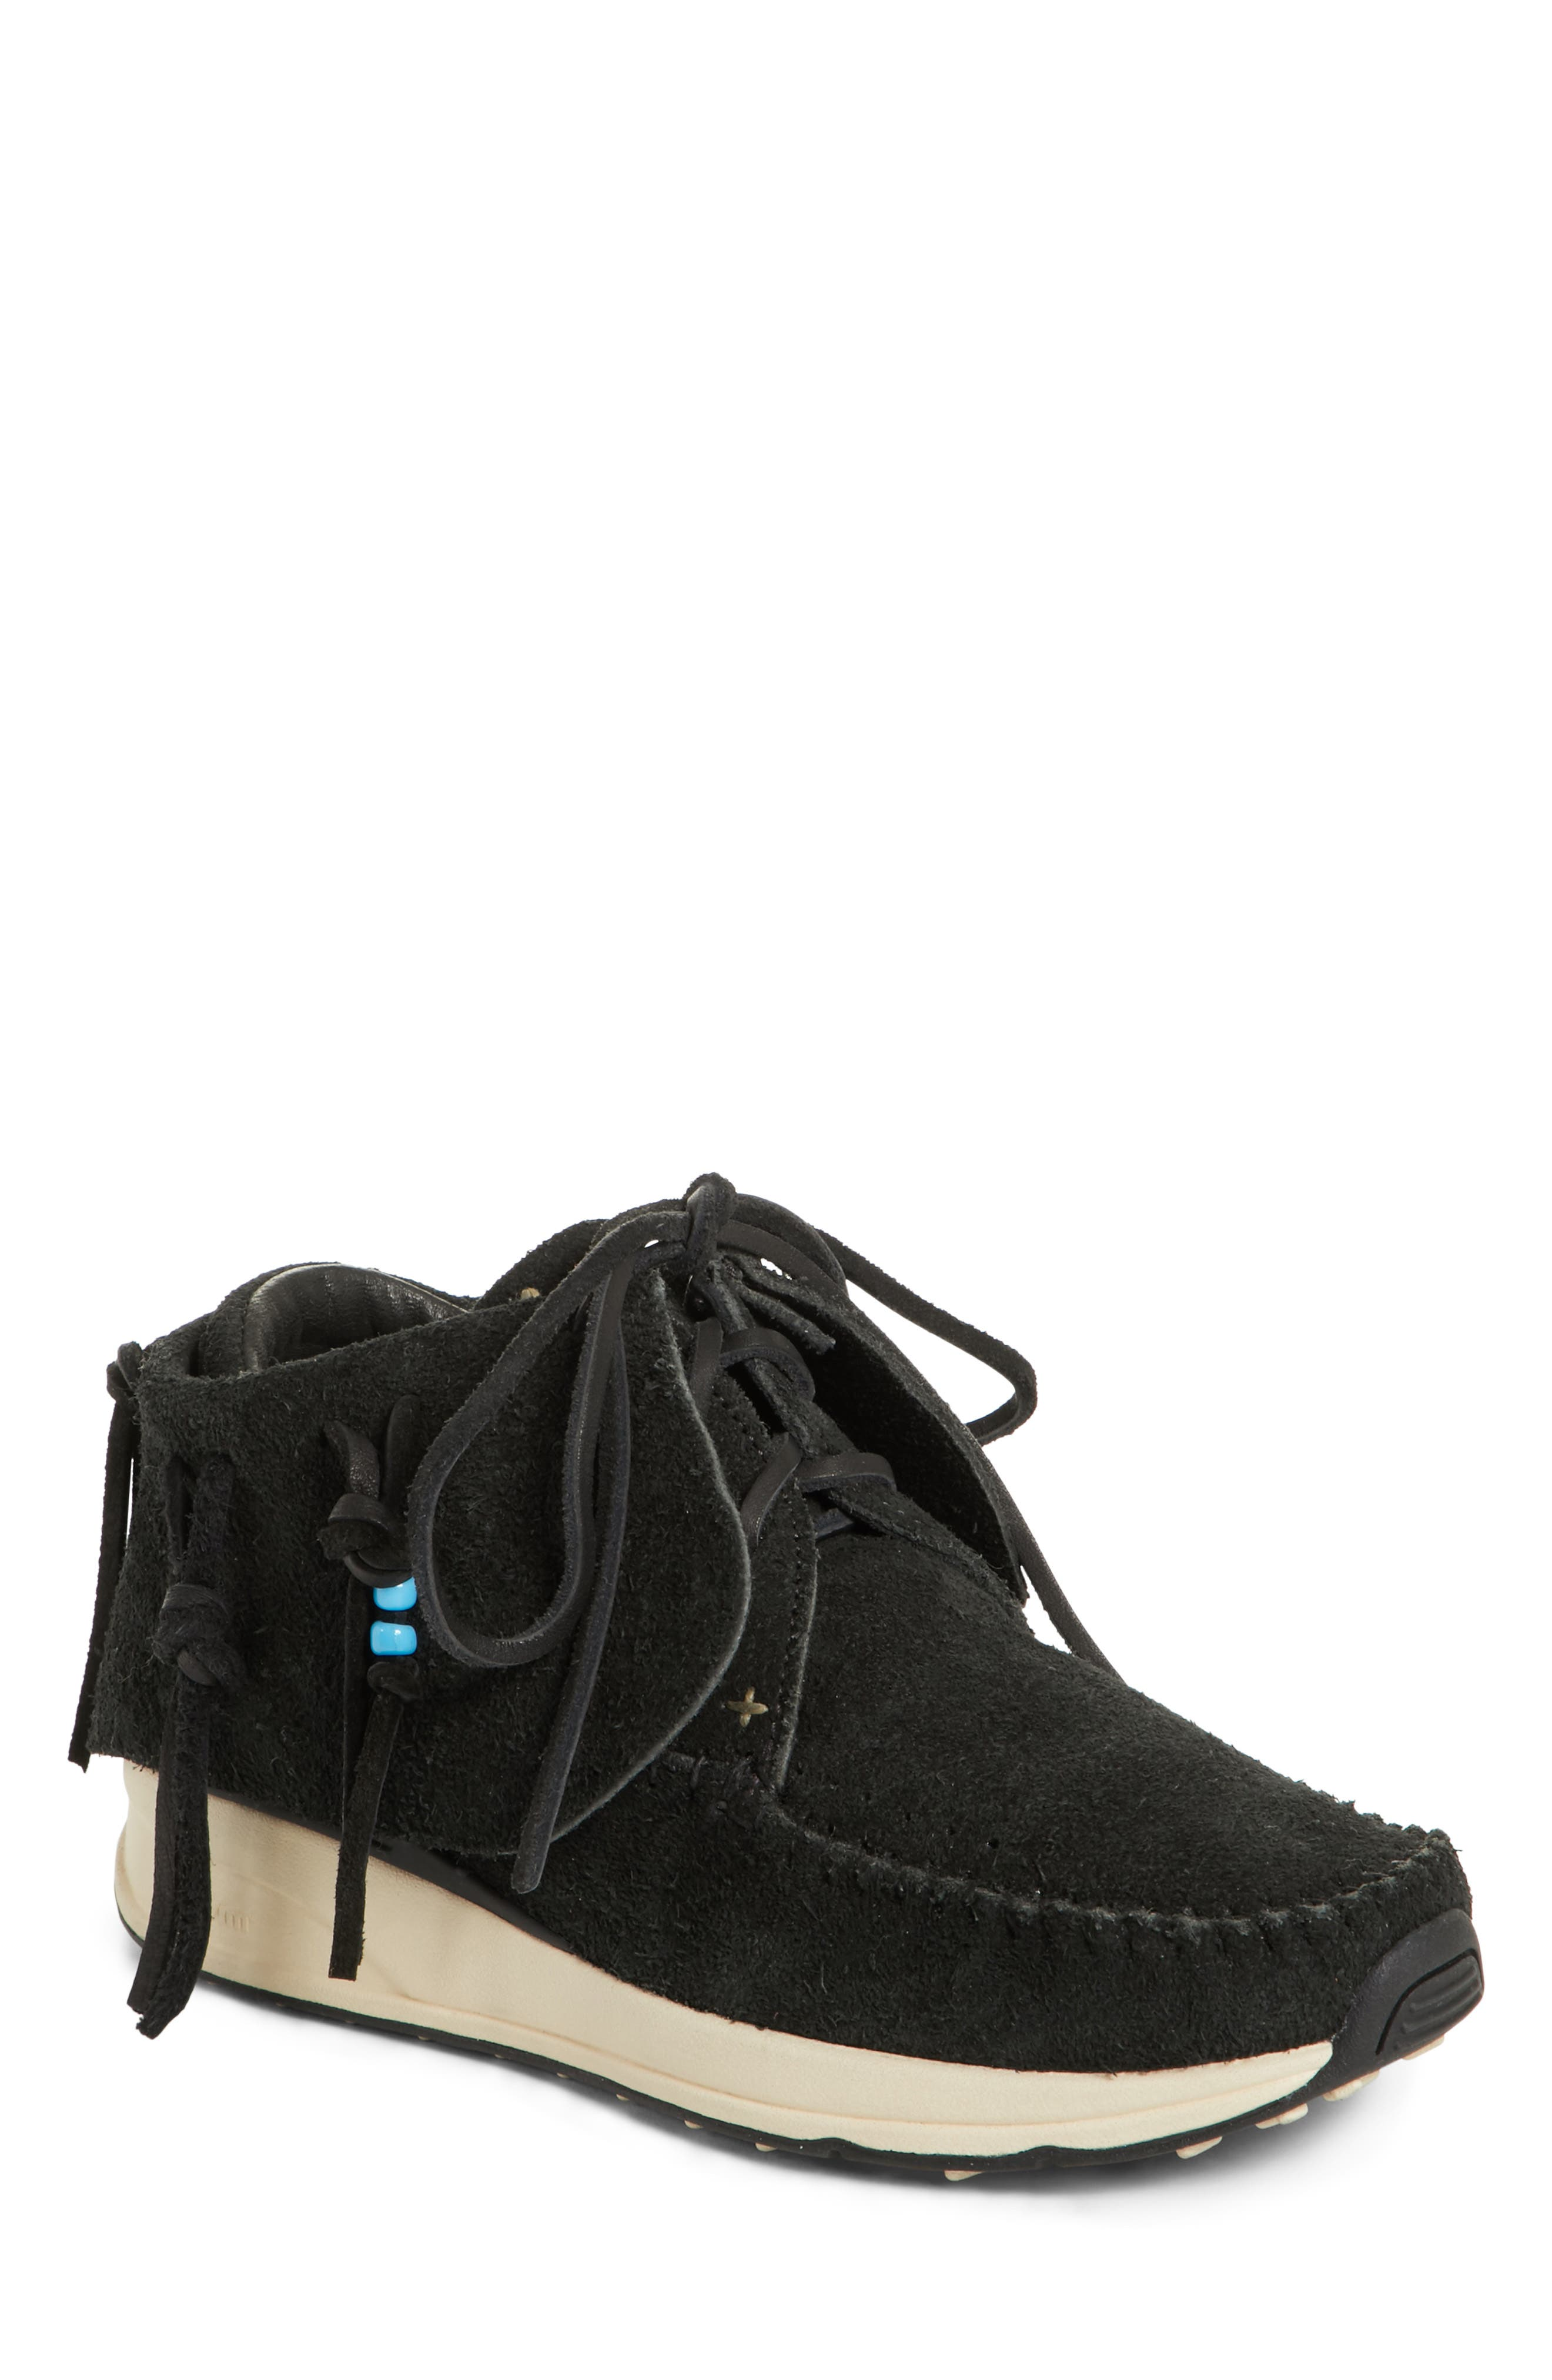 FBT Suede Moccasin Sneaker,                         Main,                         color, 003